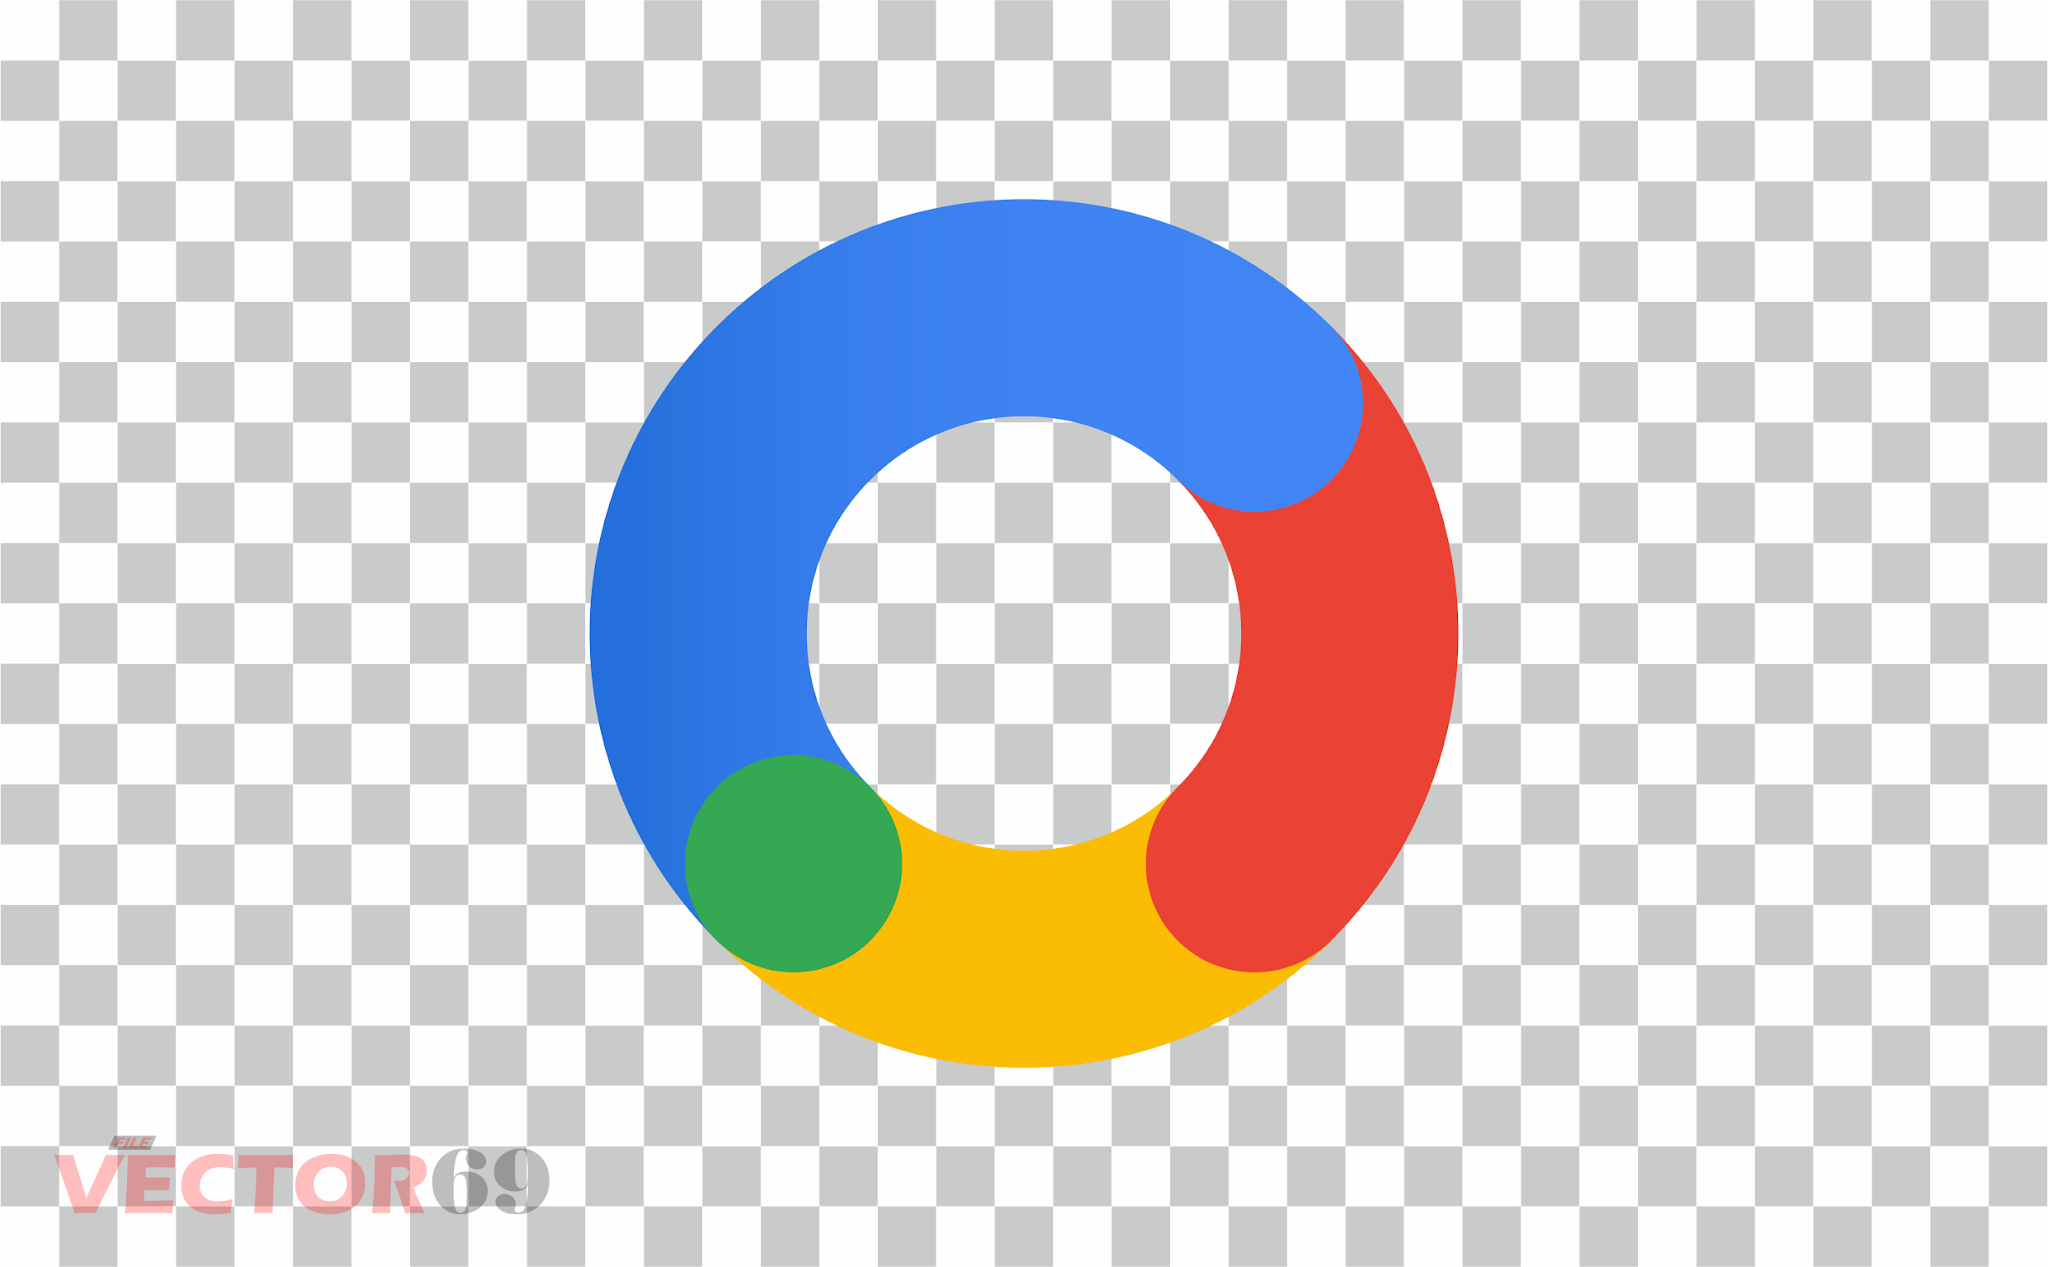 Google Marketing Platform New 2020 Logo - Download Vector File PNG (Portable Network Graphics)